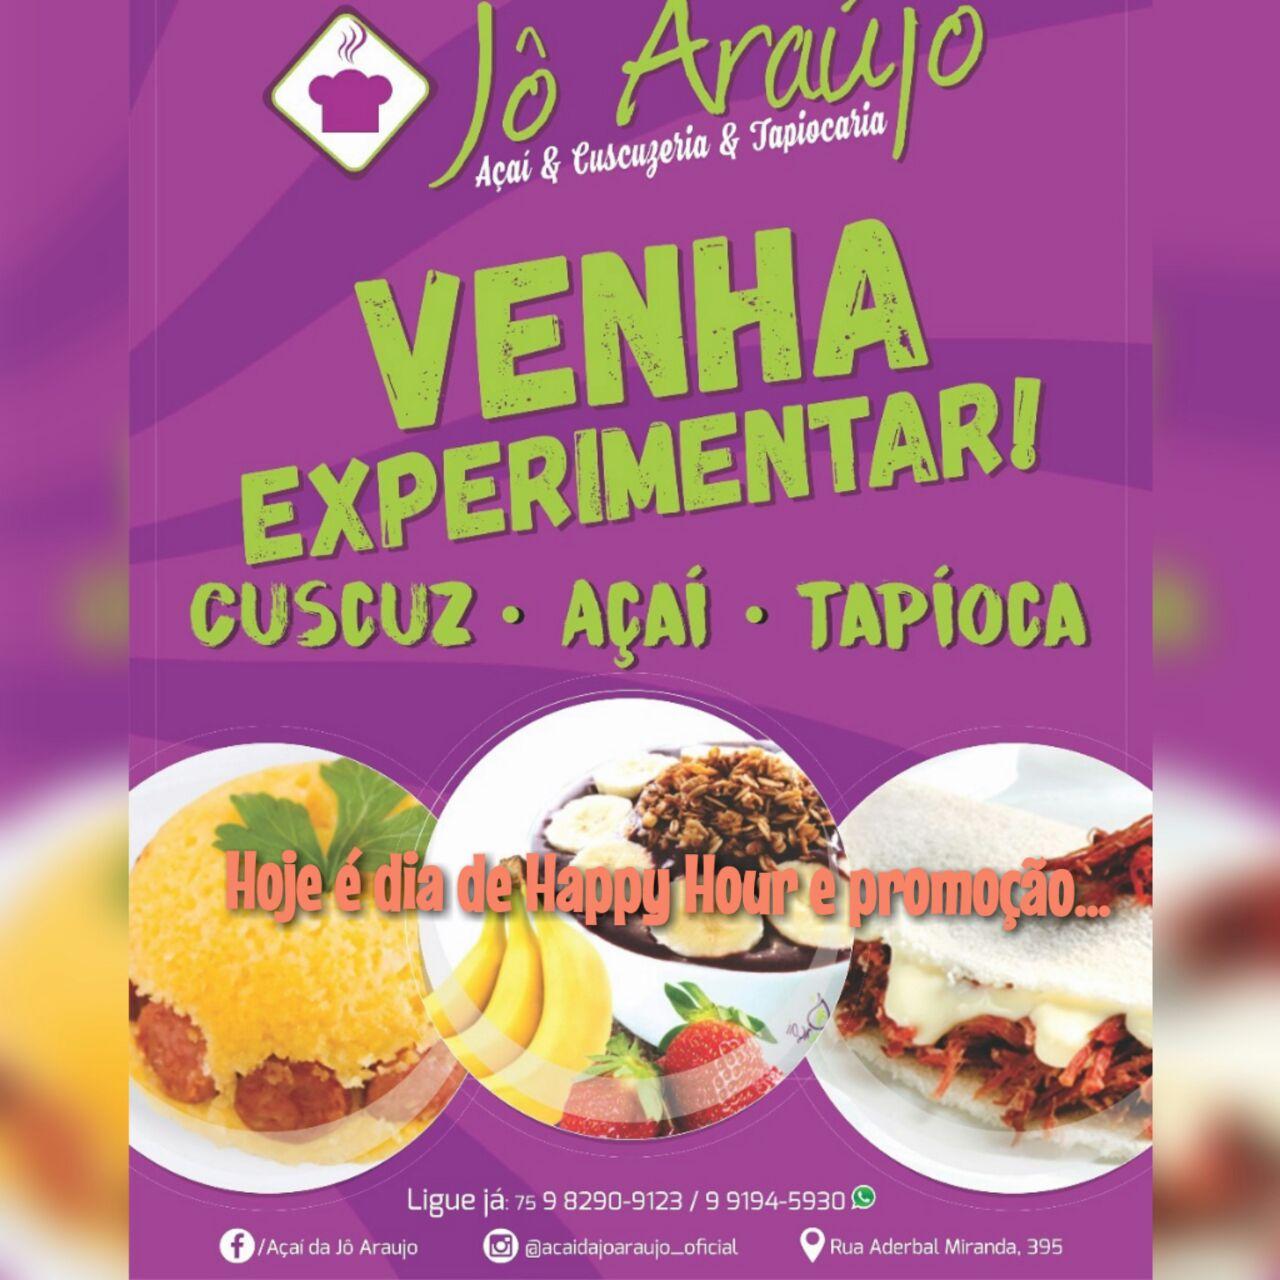 JÔ ARAÚJO - AÇAI & CUSCUZERIA & TAPIOCARIA - DELIVERY 98290-9123